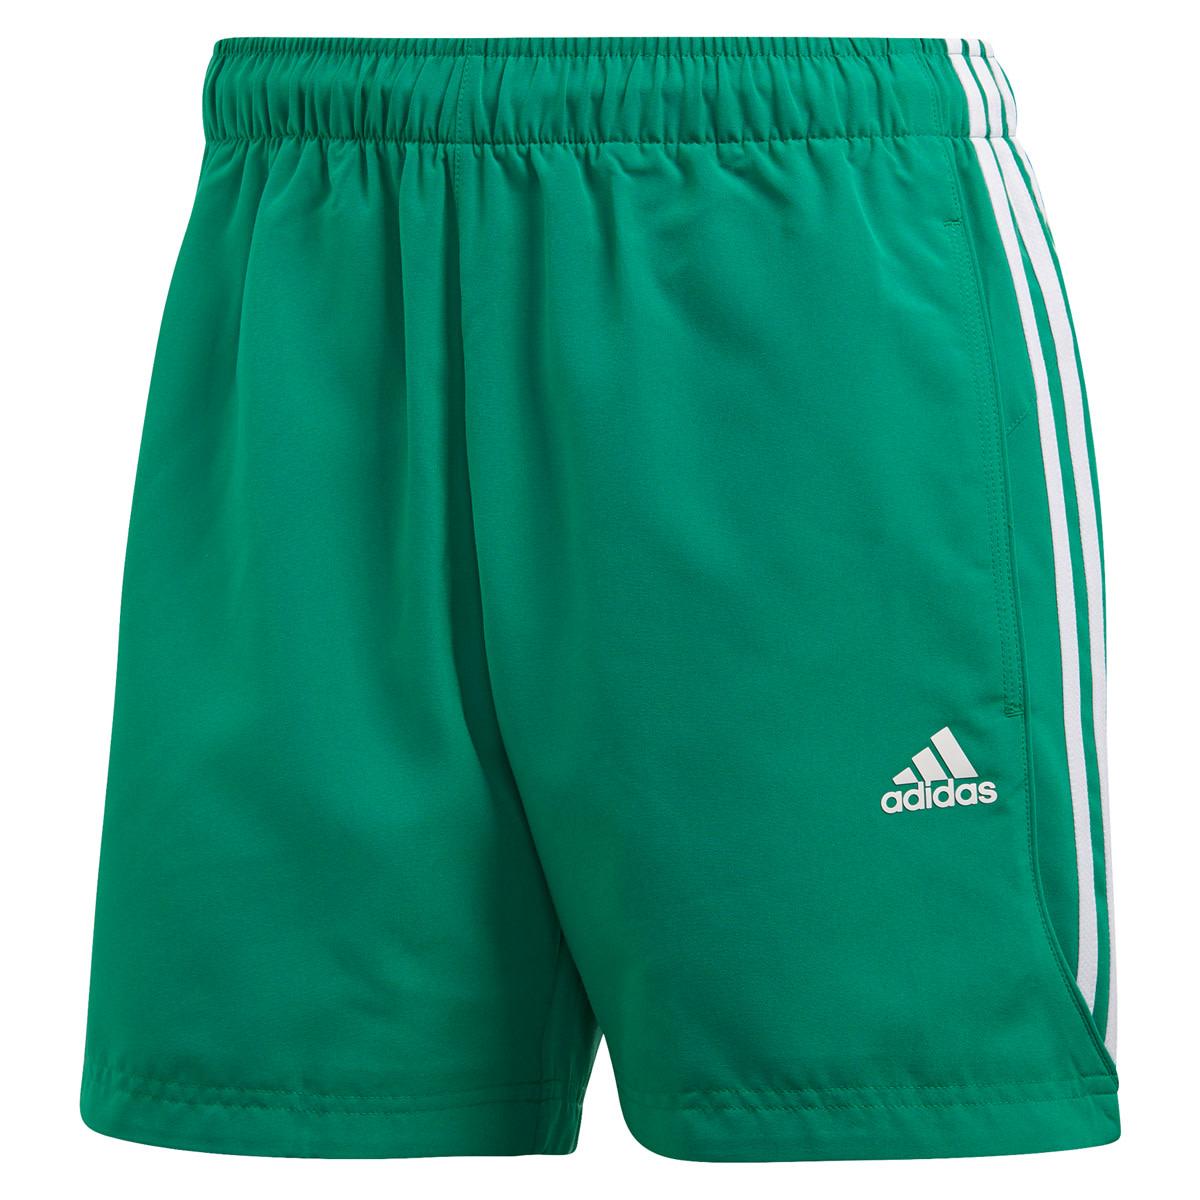 Pantalones cortos adidas Sport Sport Essentials 3 Pantalones Stripes Stripes Chelsea 84cc296 - hotlink.pw